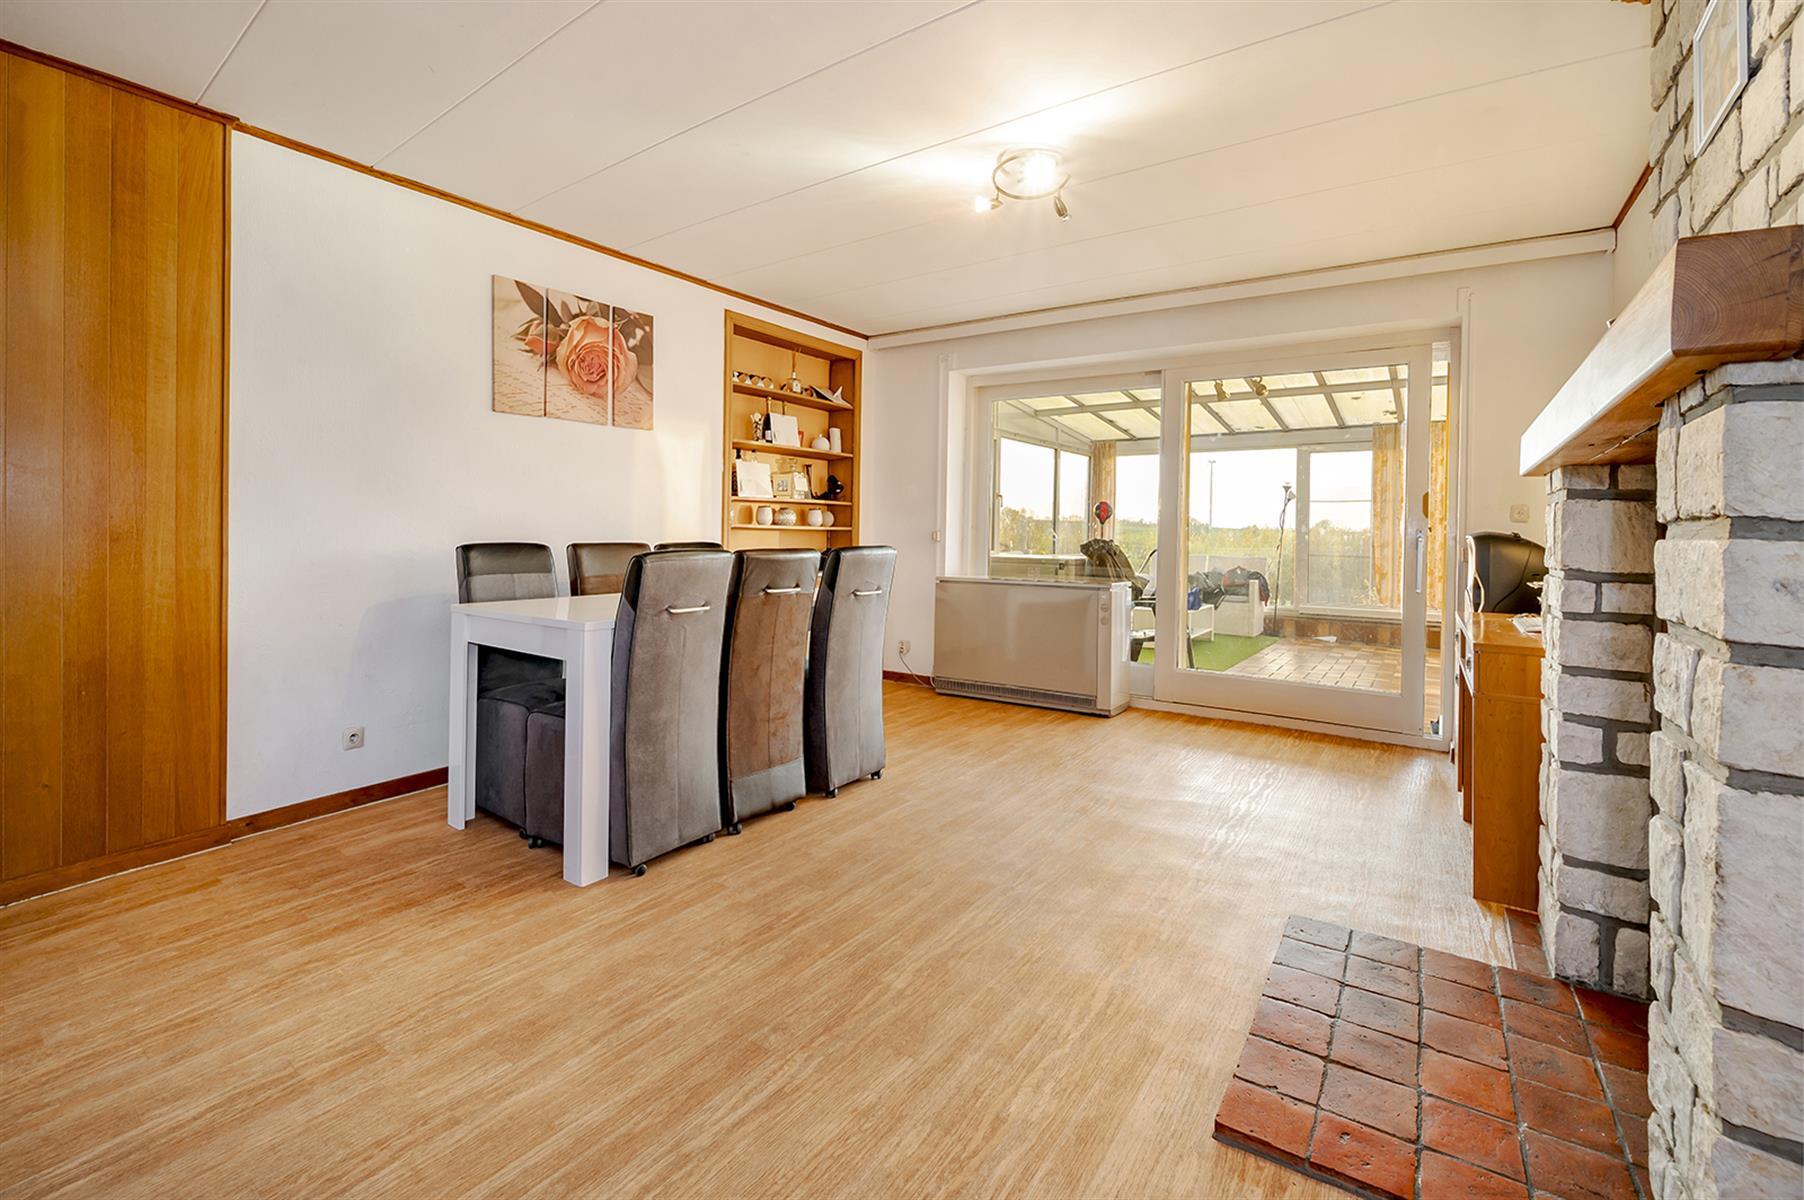 Appartement - Lincent Pellaines - #3888397-7